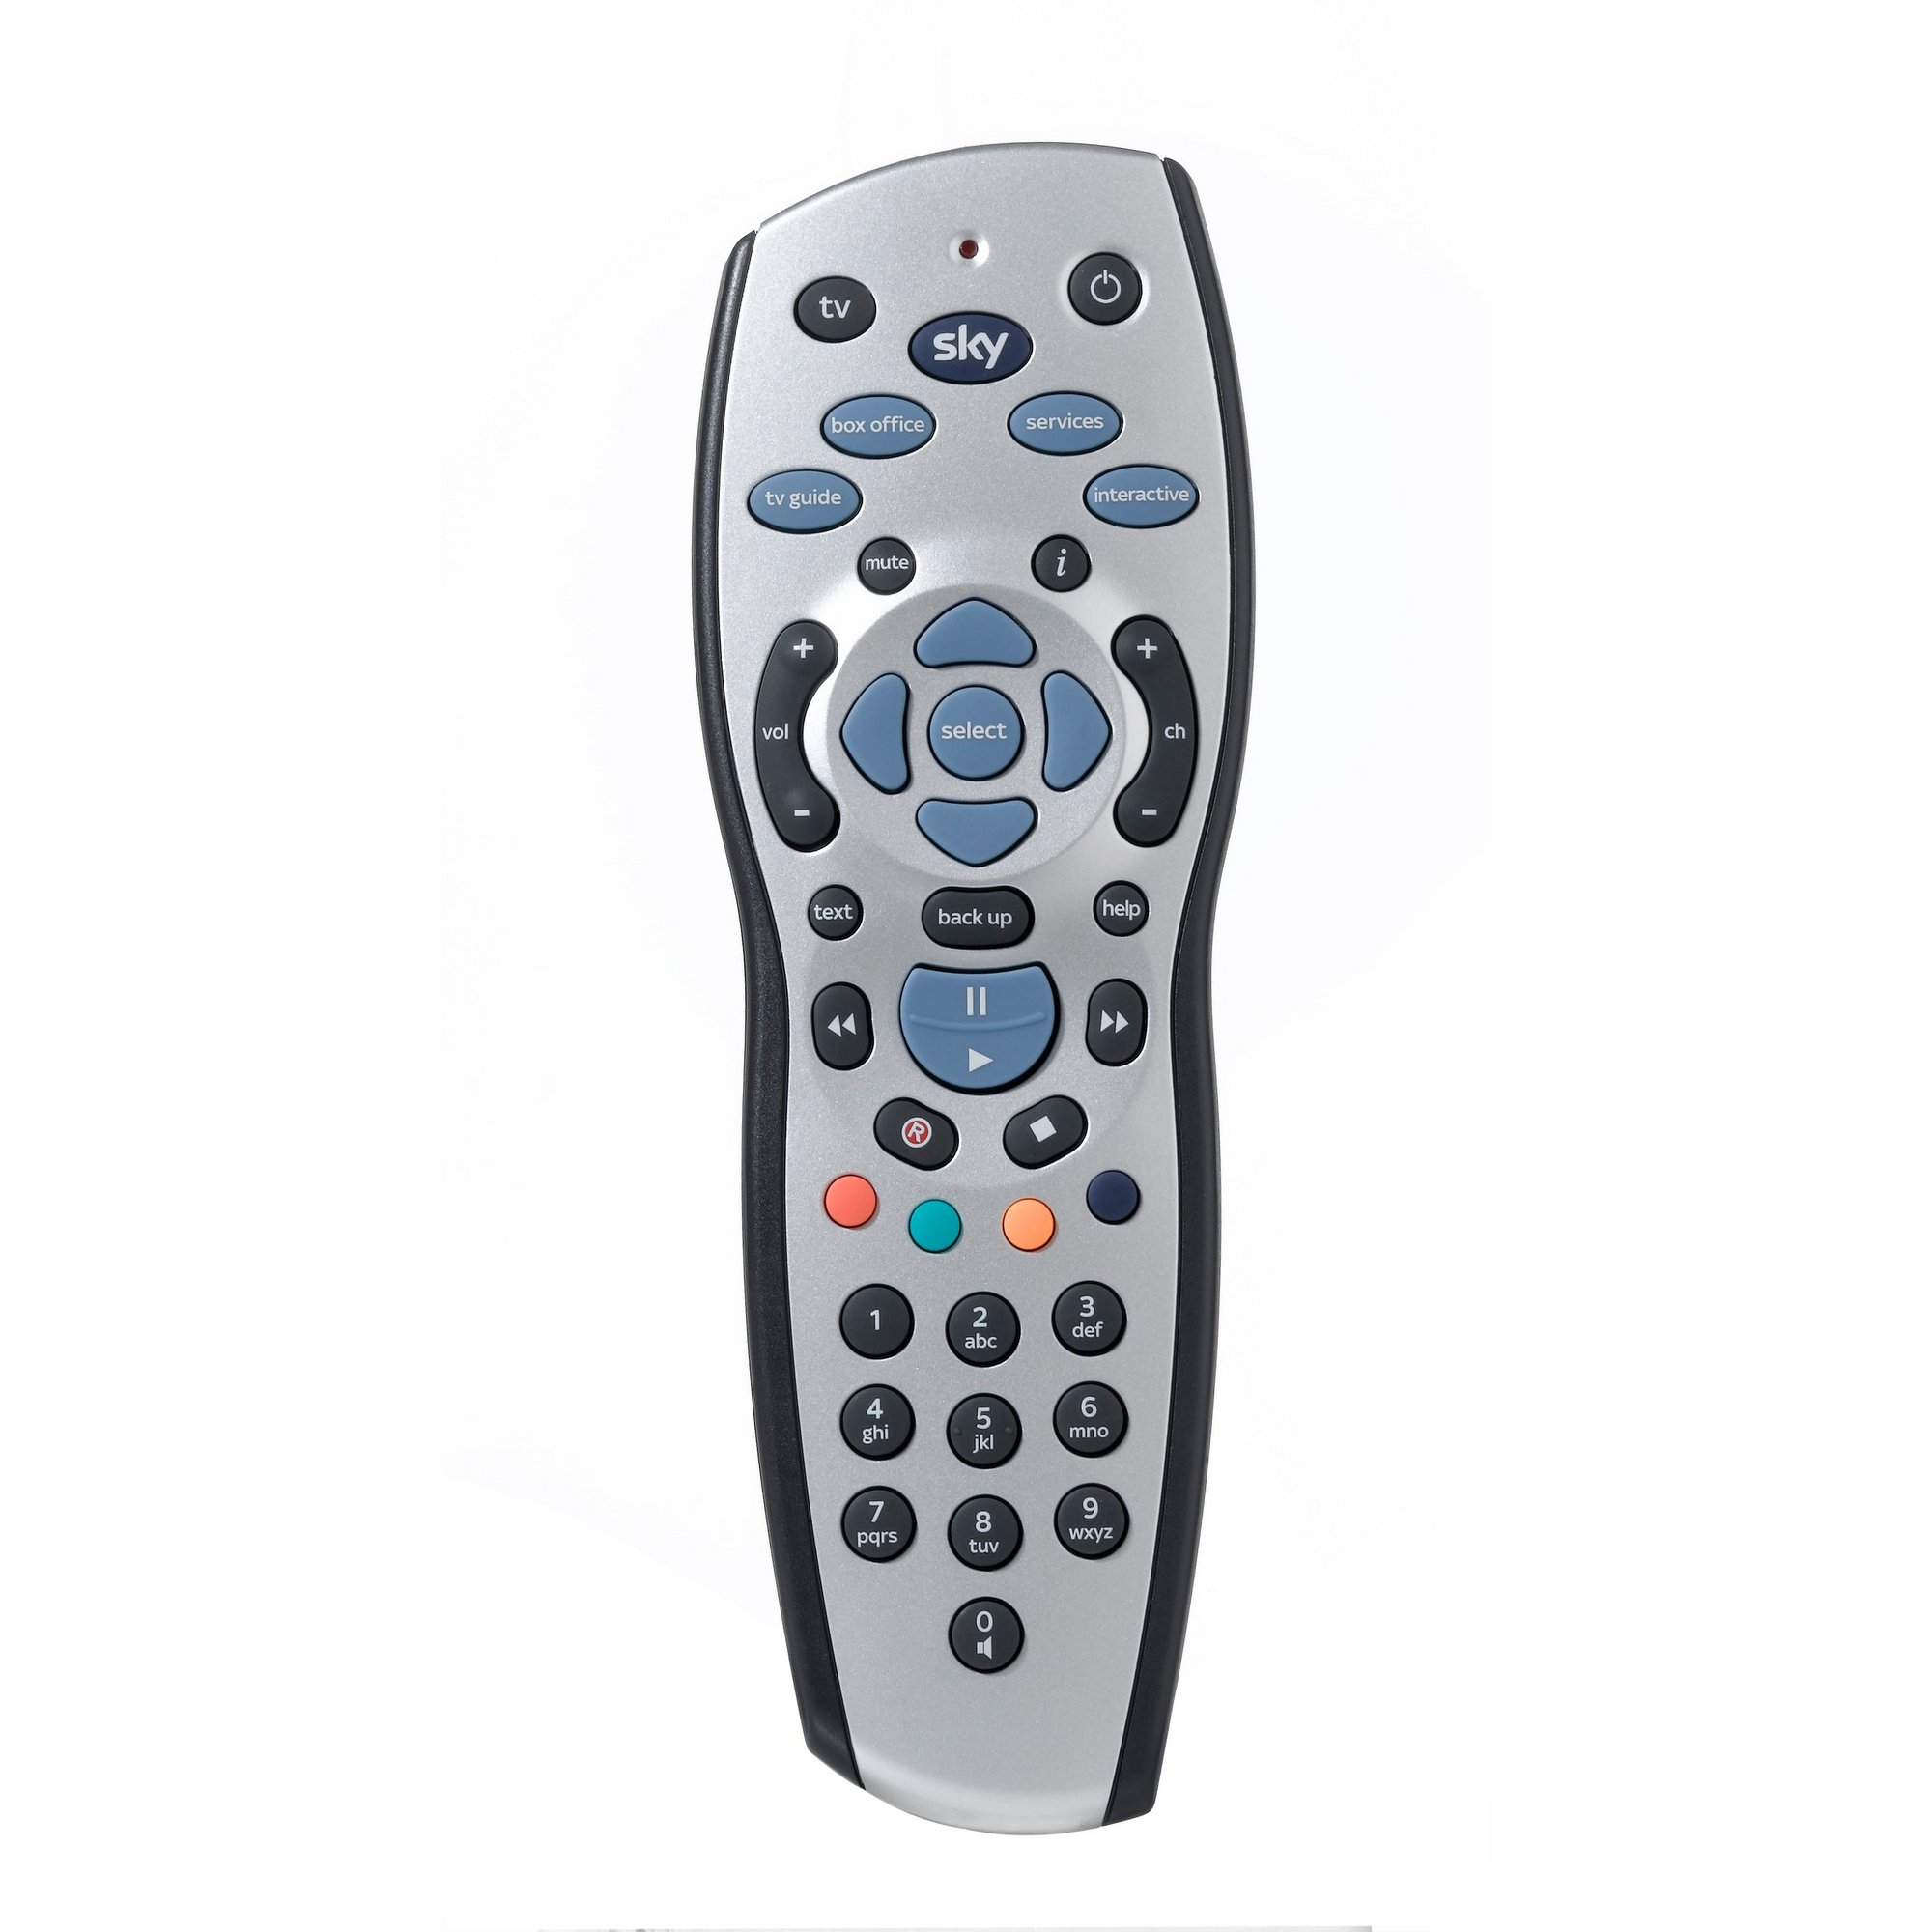 Image of SKY+ HD Remote Control